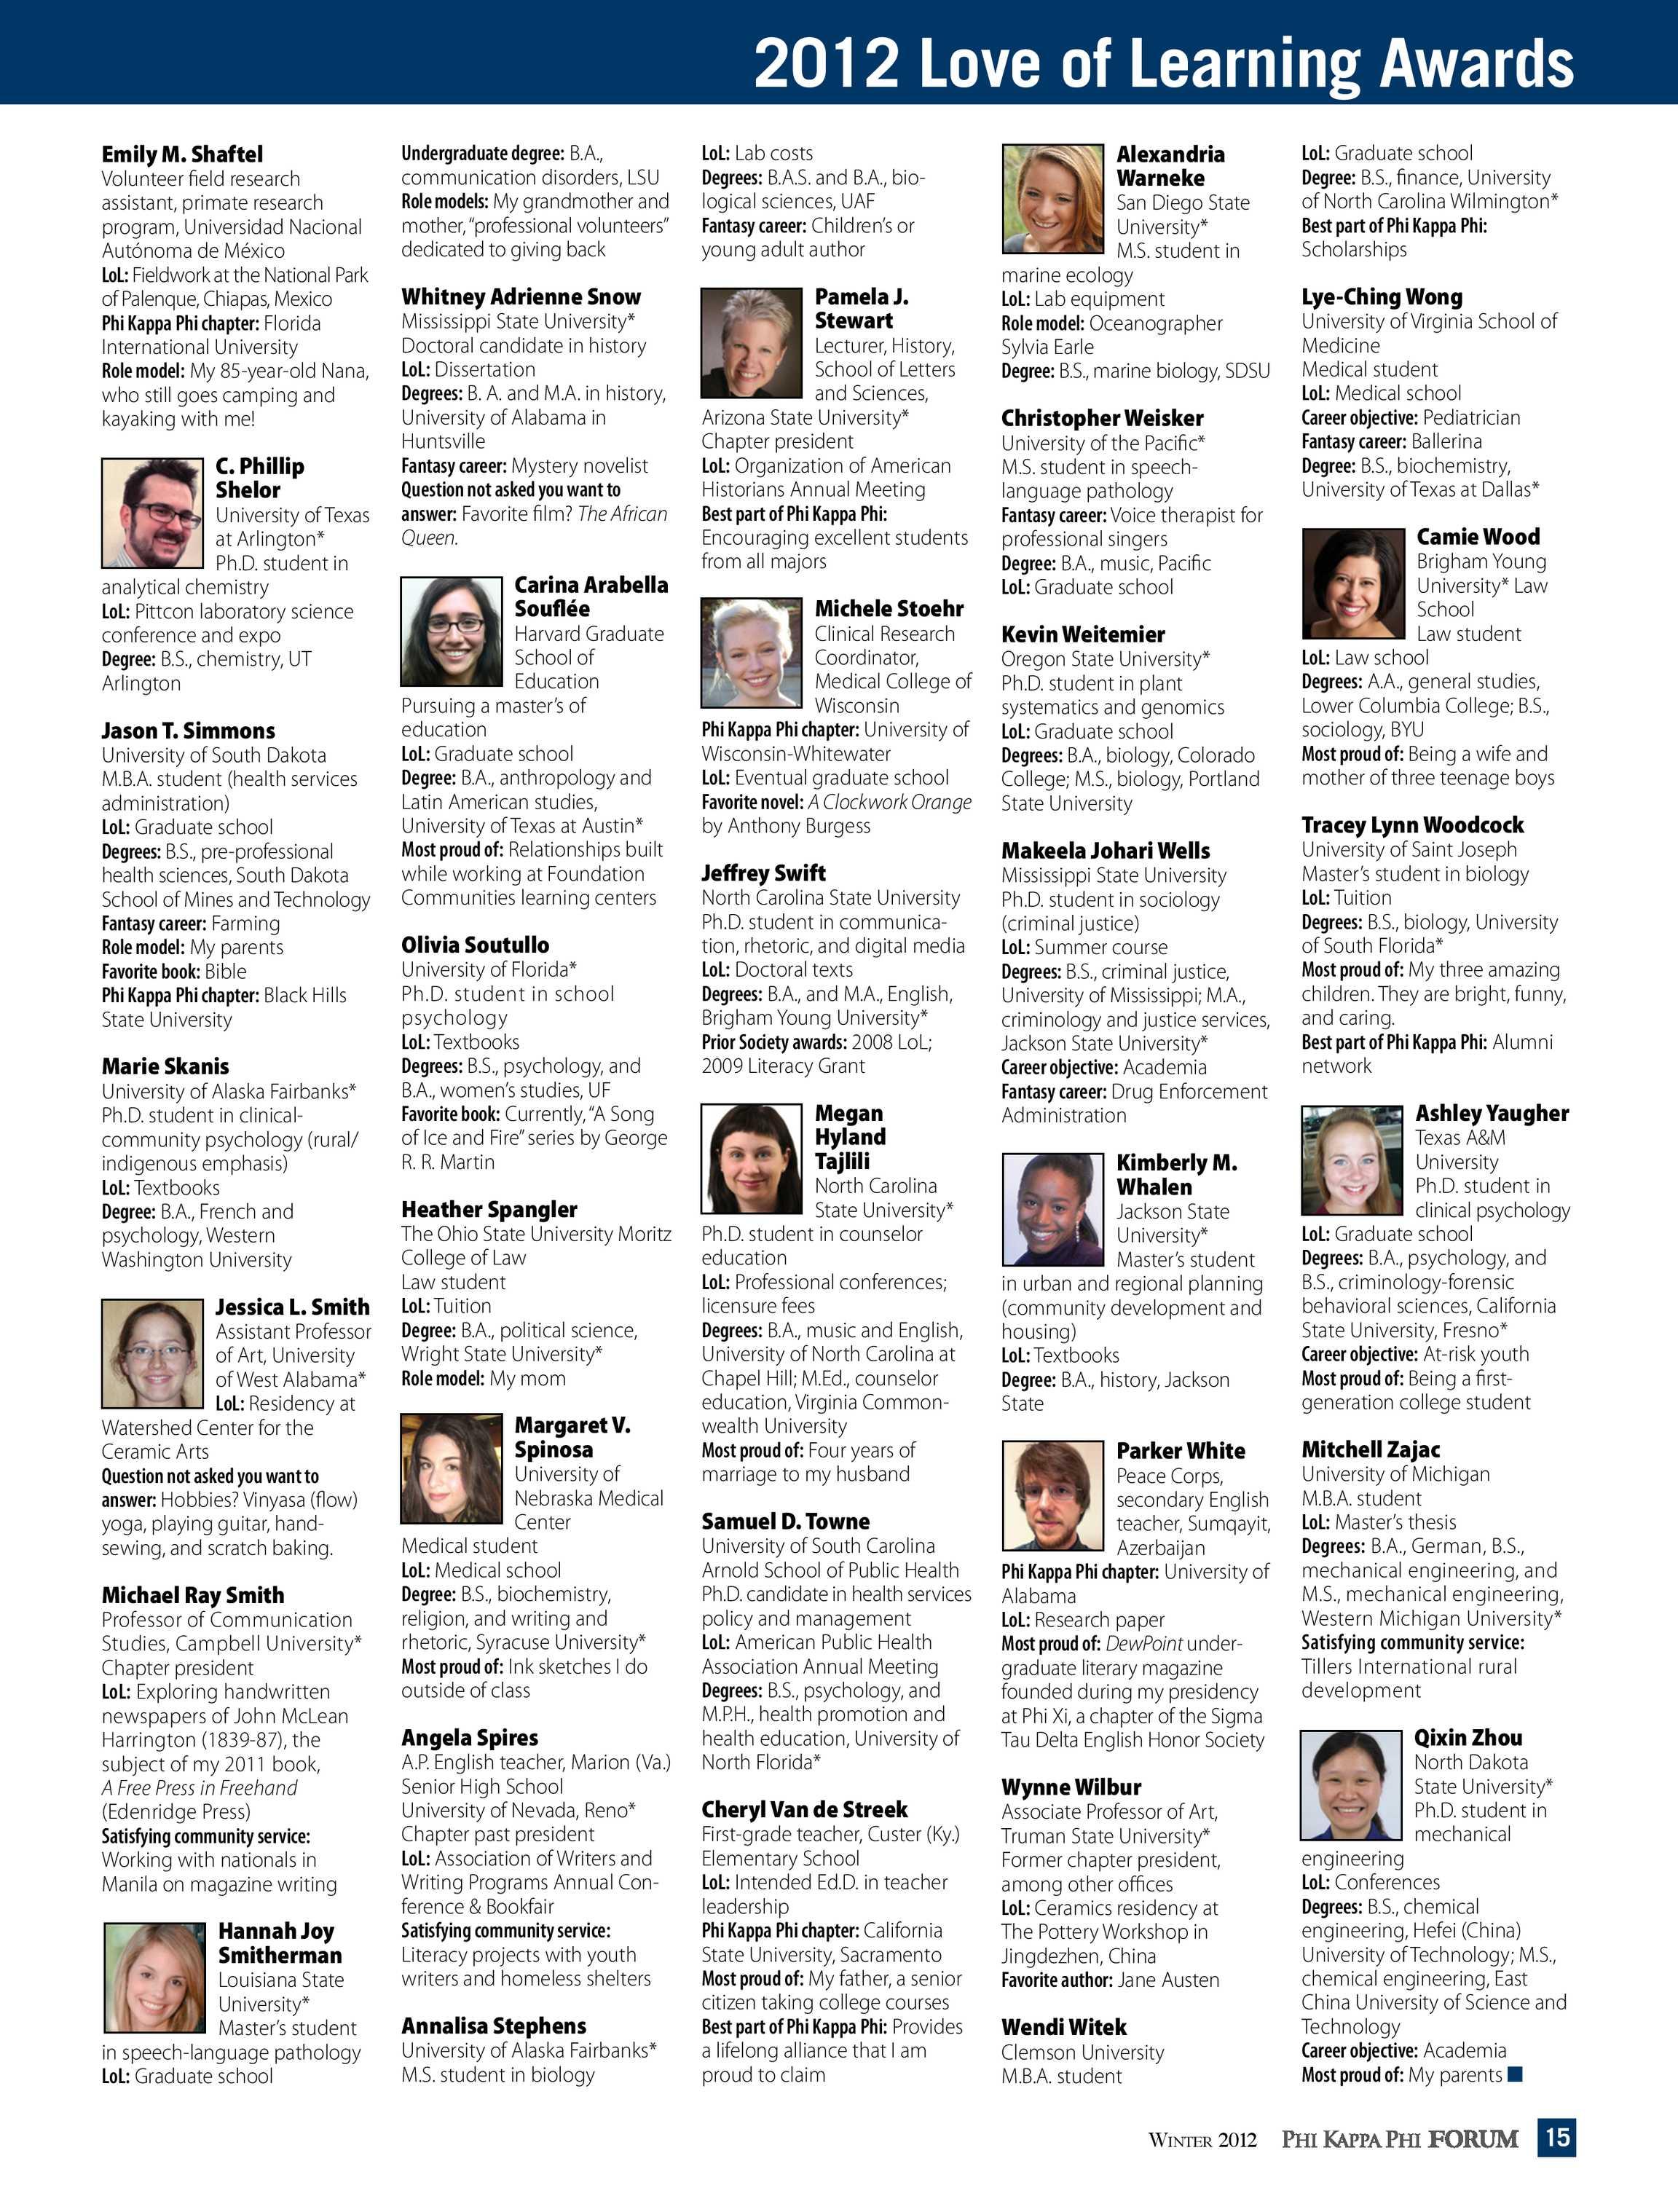 Phi Kappa Phi Forum - Winter 2012 - page 15